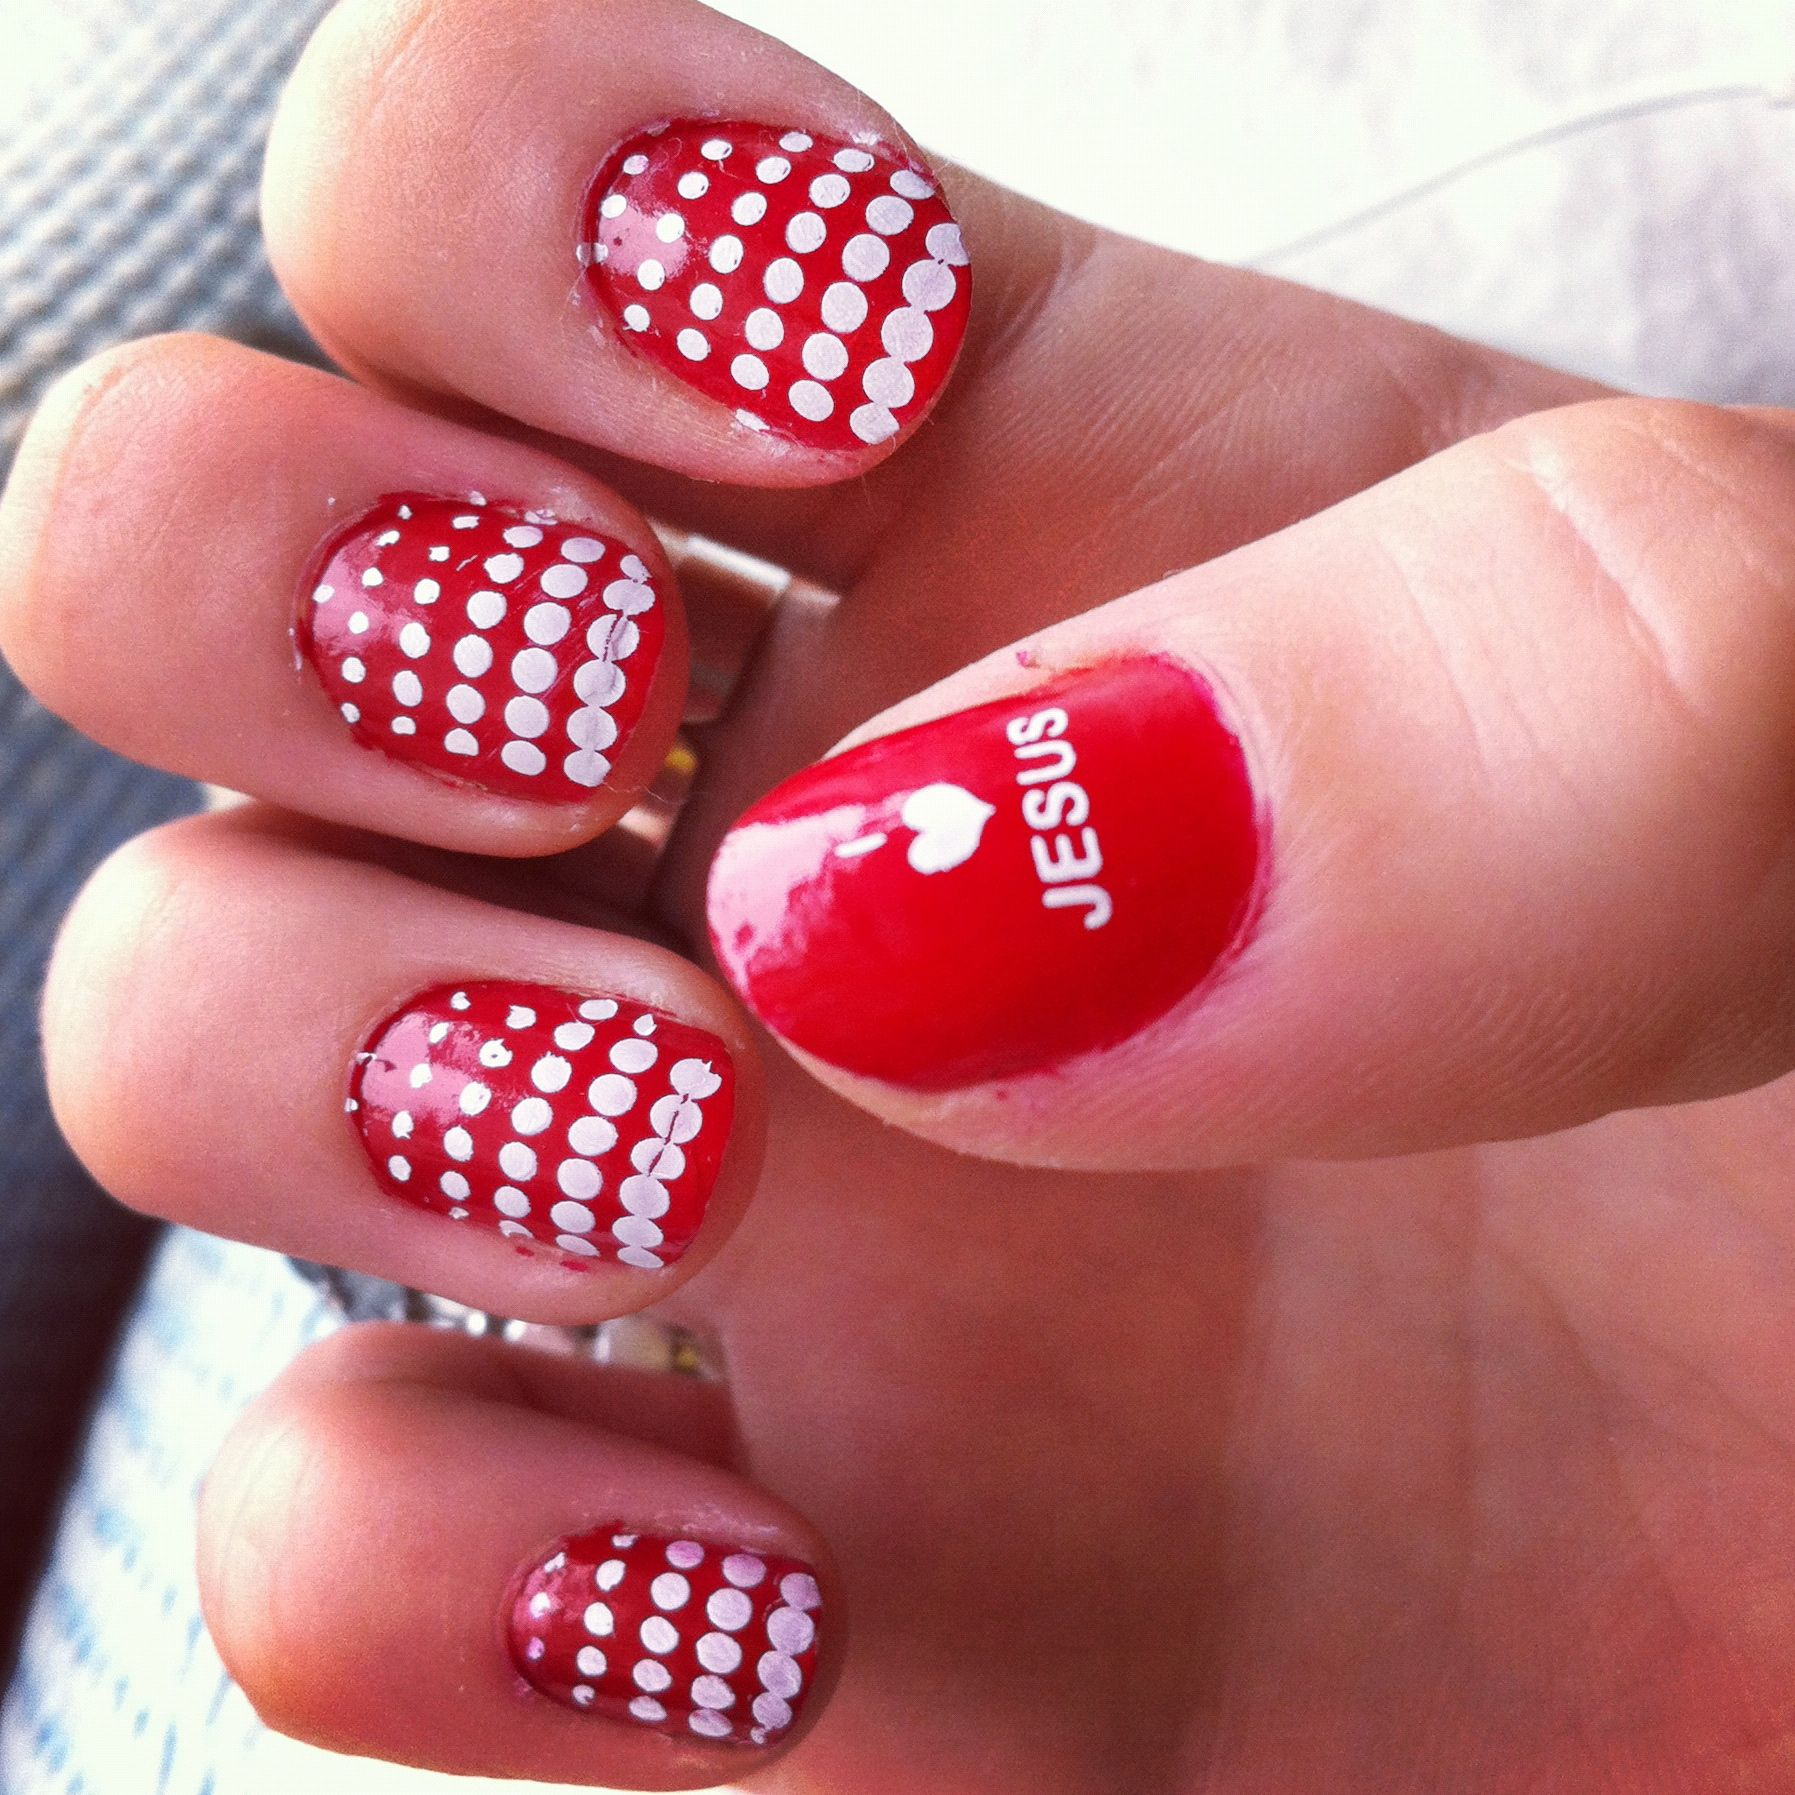 jesus nails   Fingernail and Toenail Designs   Pinterest